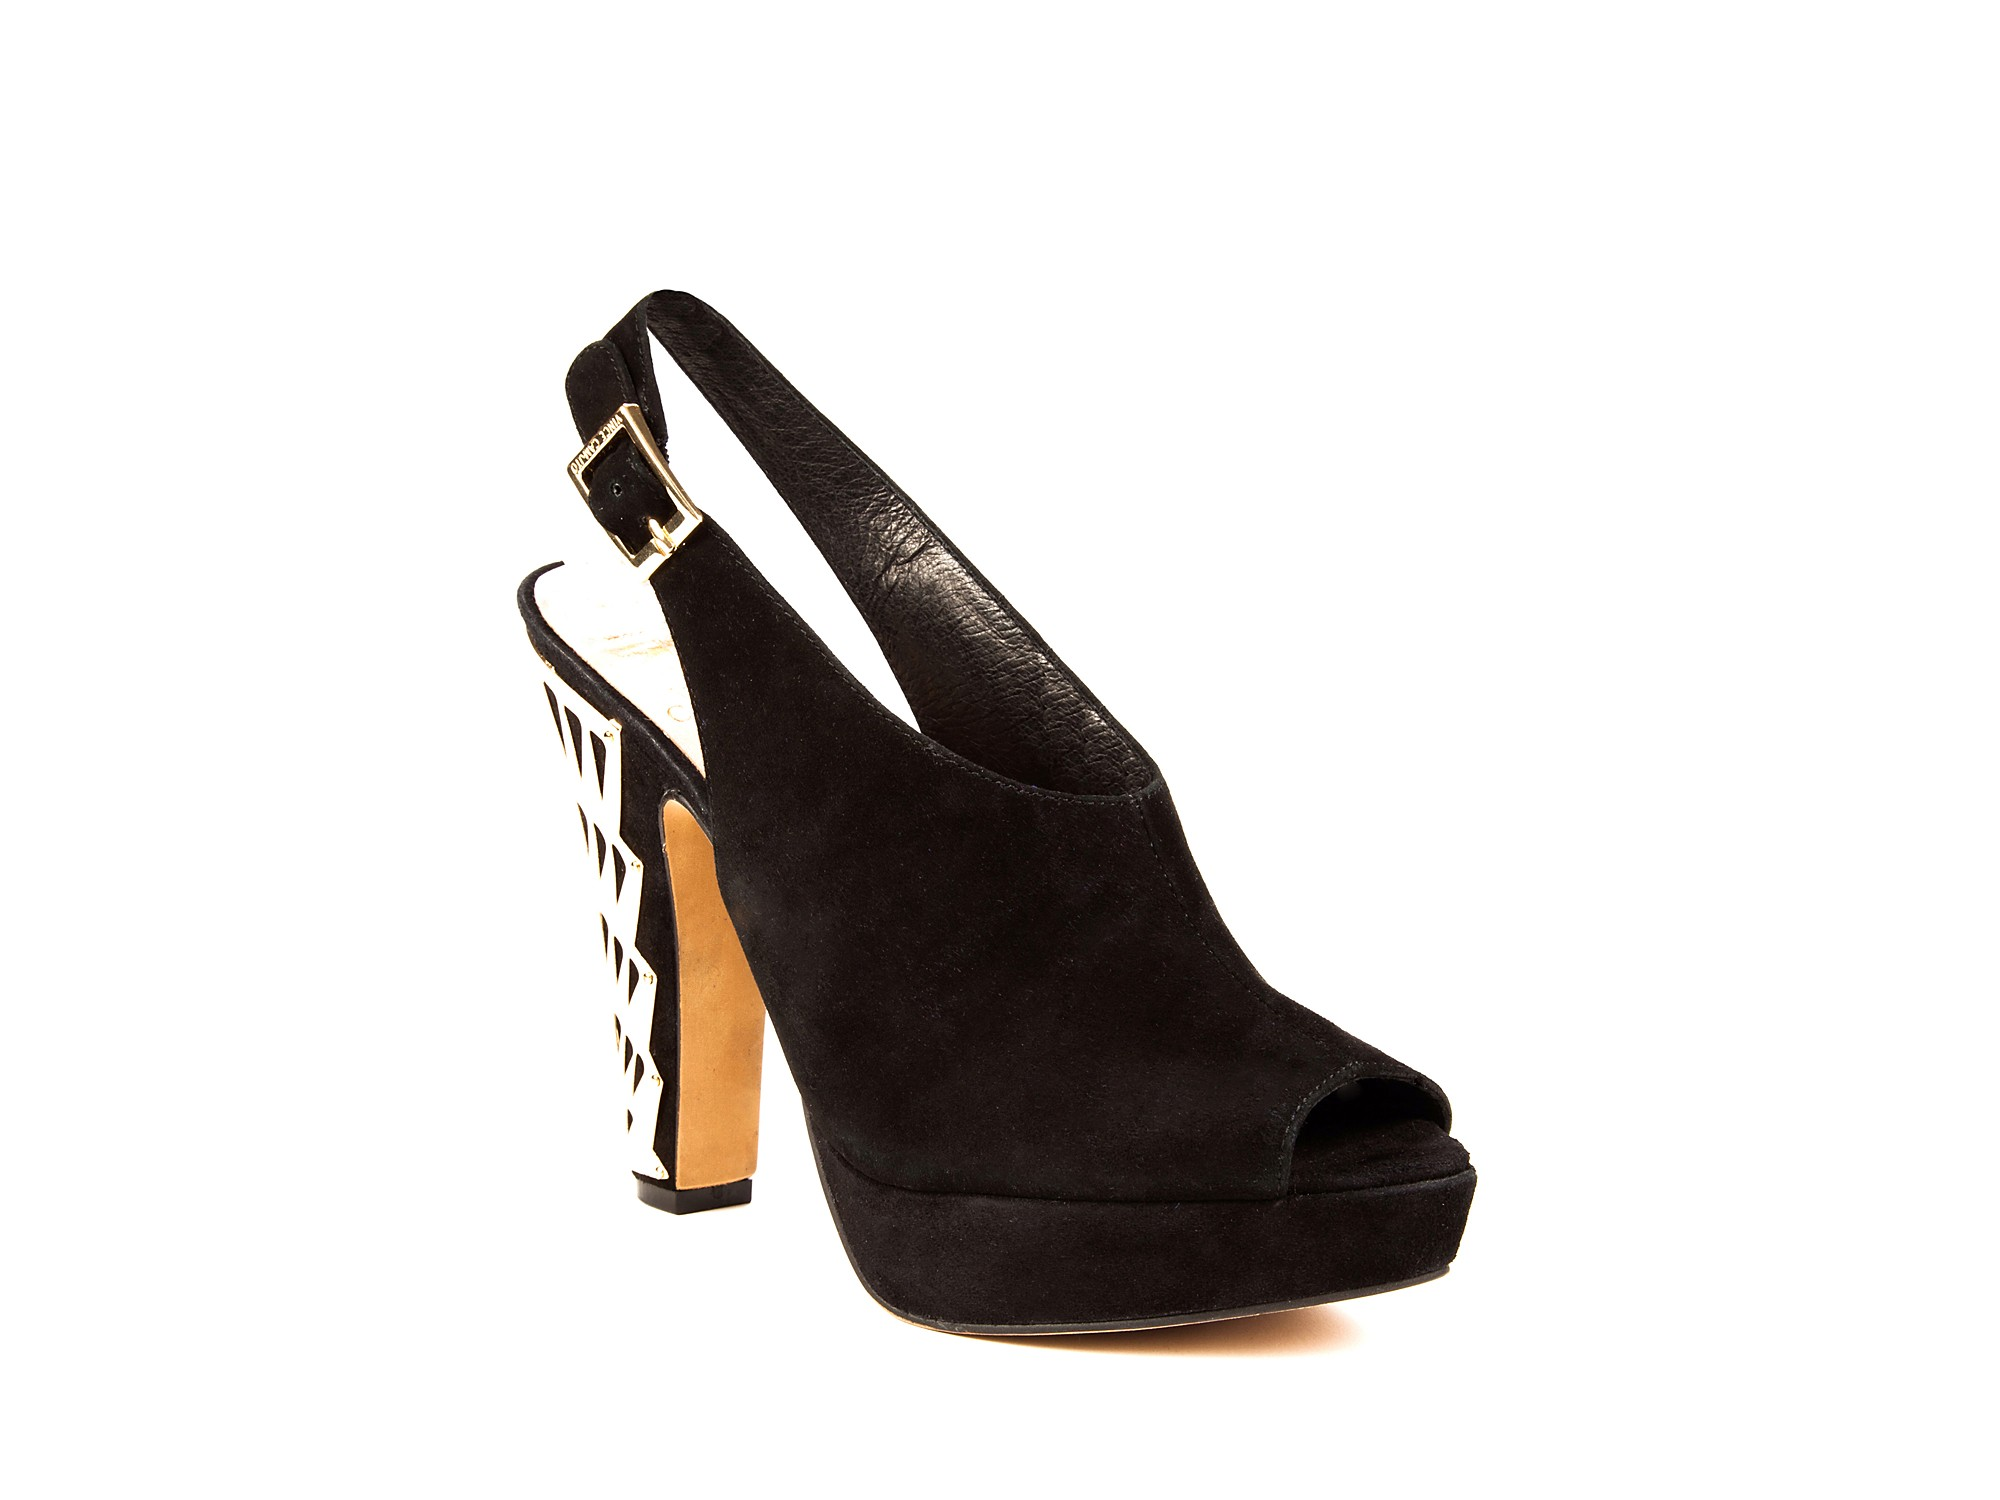 Vince Camuto Sling Back Peep Toe Sandals Duran High Heel